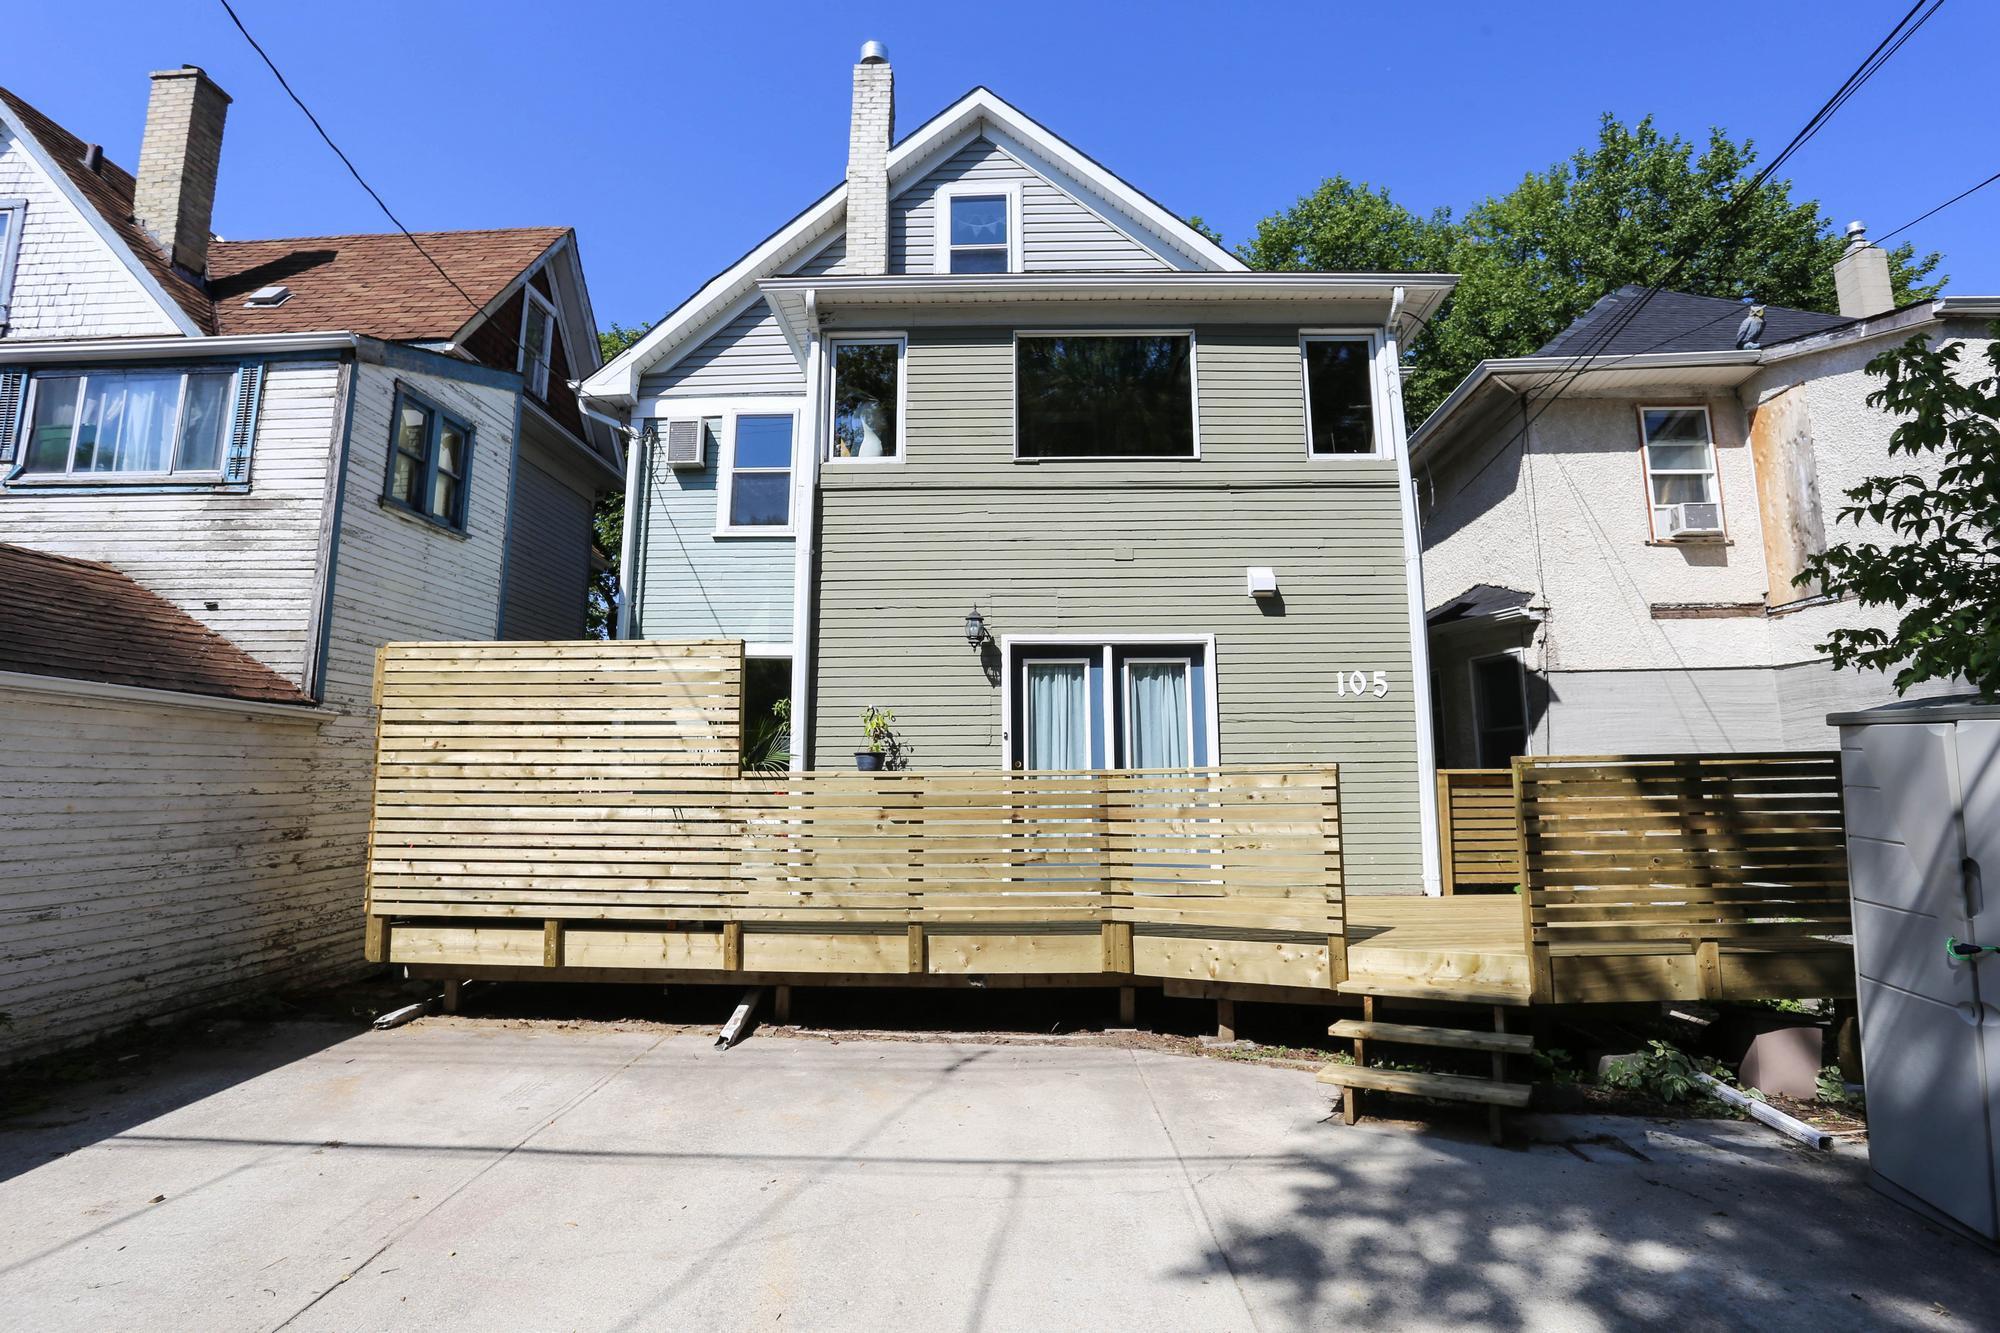 Photo 35: Photos: 105 Evanson Street in Winnipeg: Wolseley Single Family Detached for sale (5B)  : MLS®# 1821900